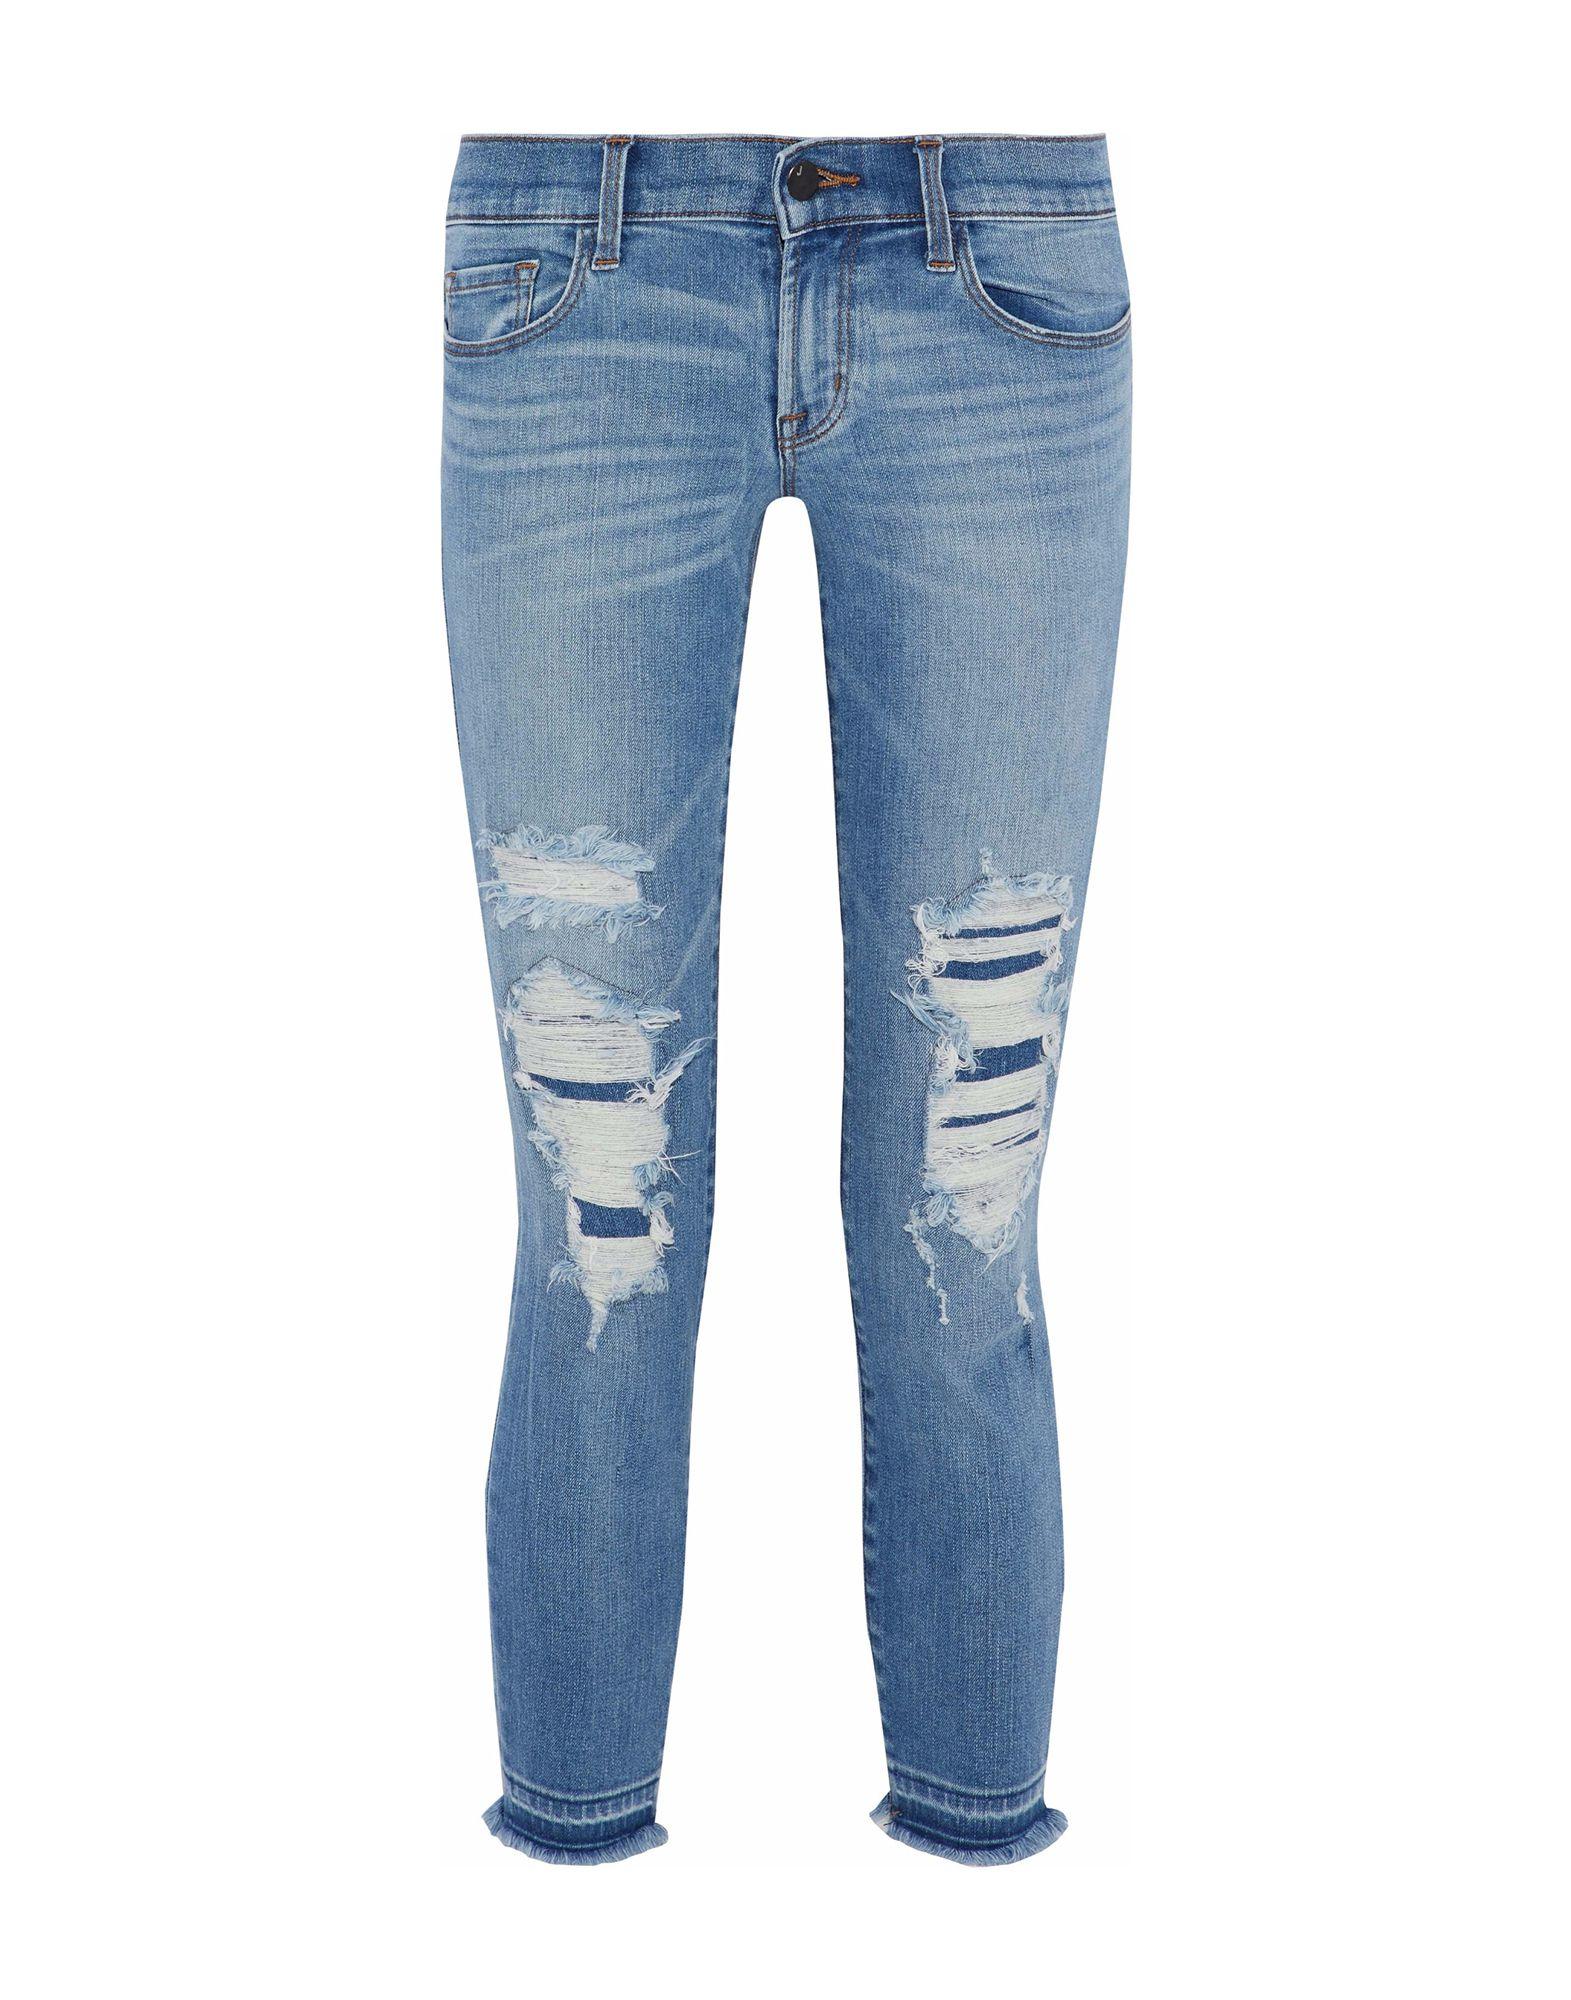 J BRAND Denim pants - Item 42704968